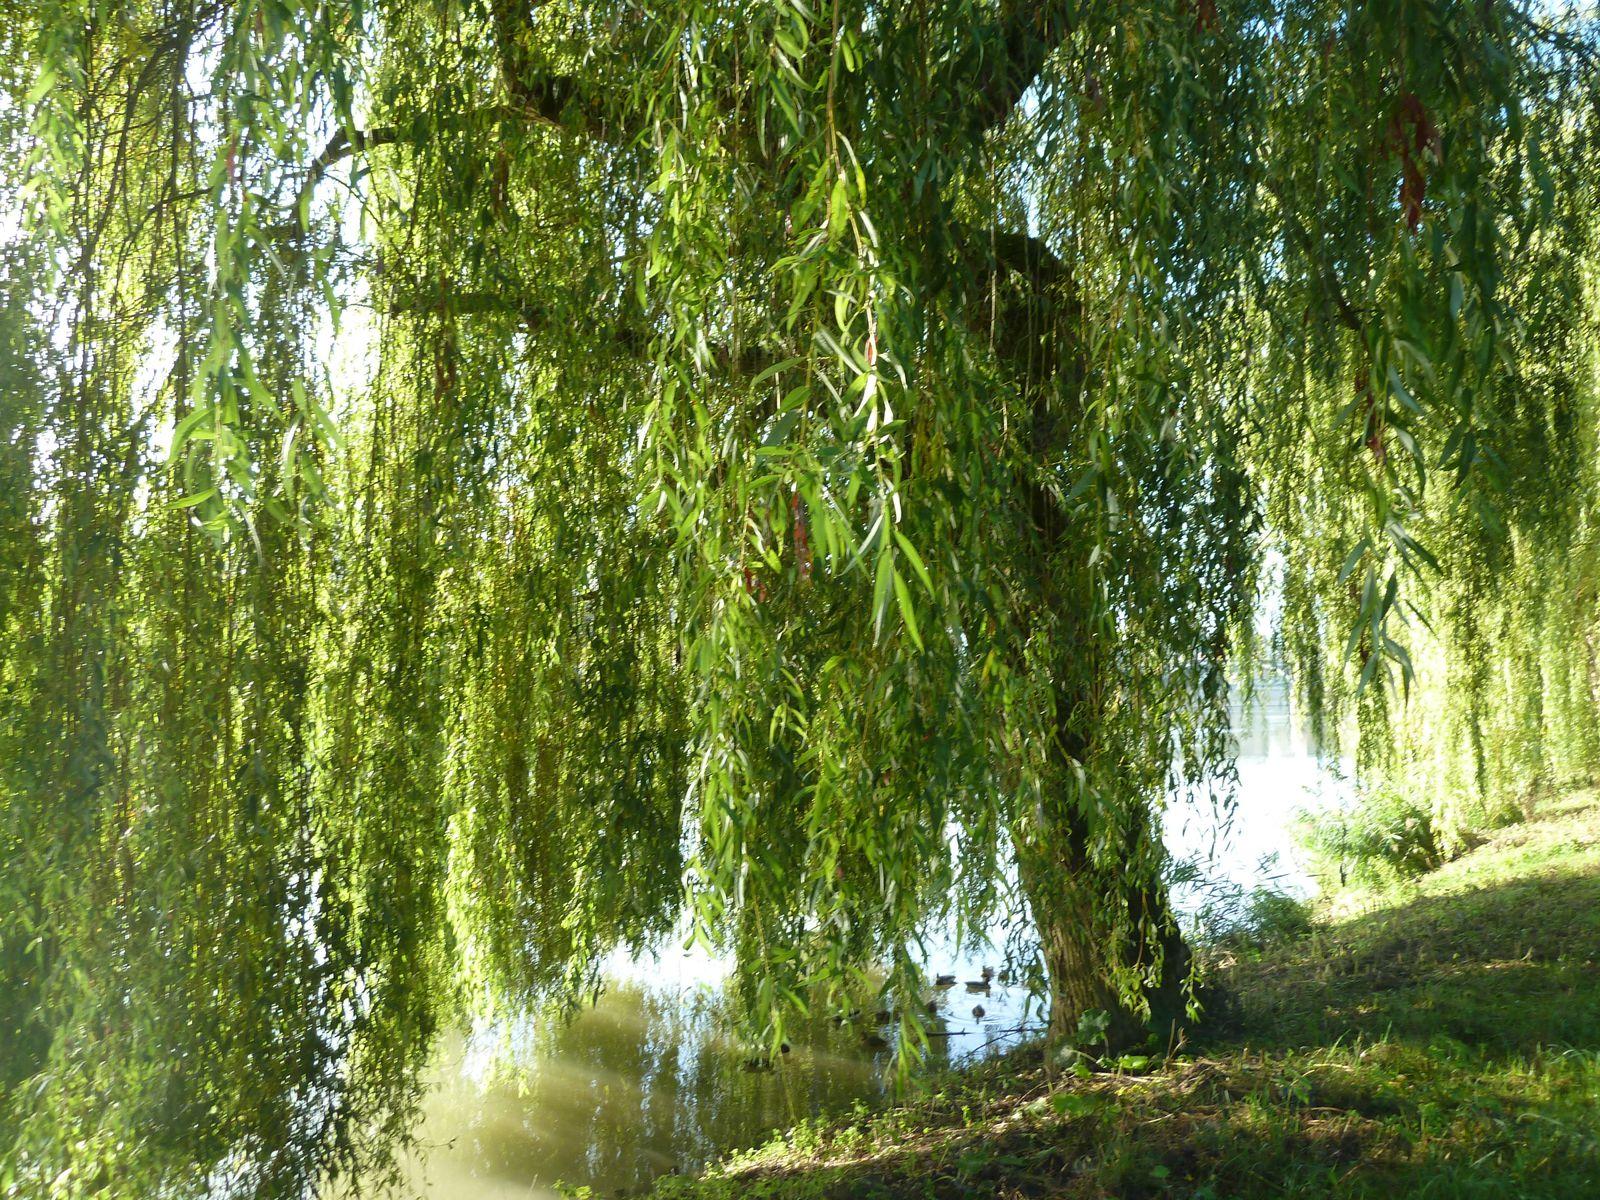 La magnifique promenade sur le bord de la Marne.